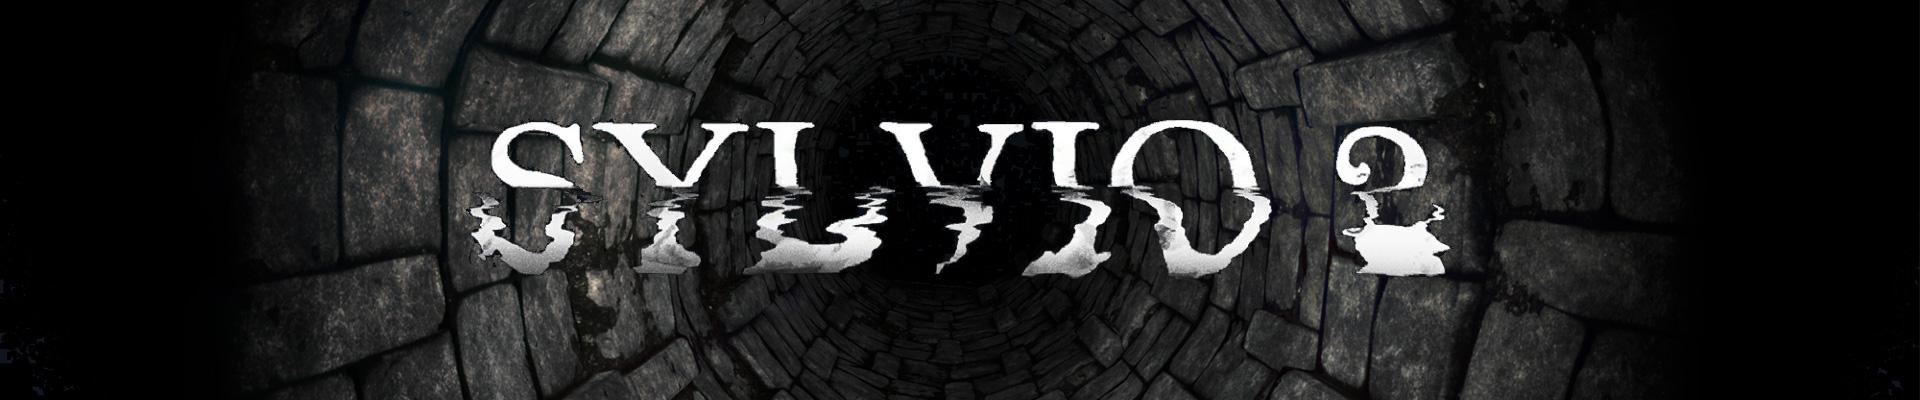 Thoughts on: Sylvio 2